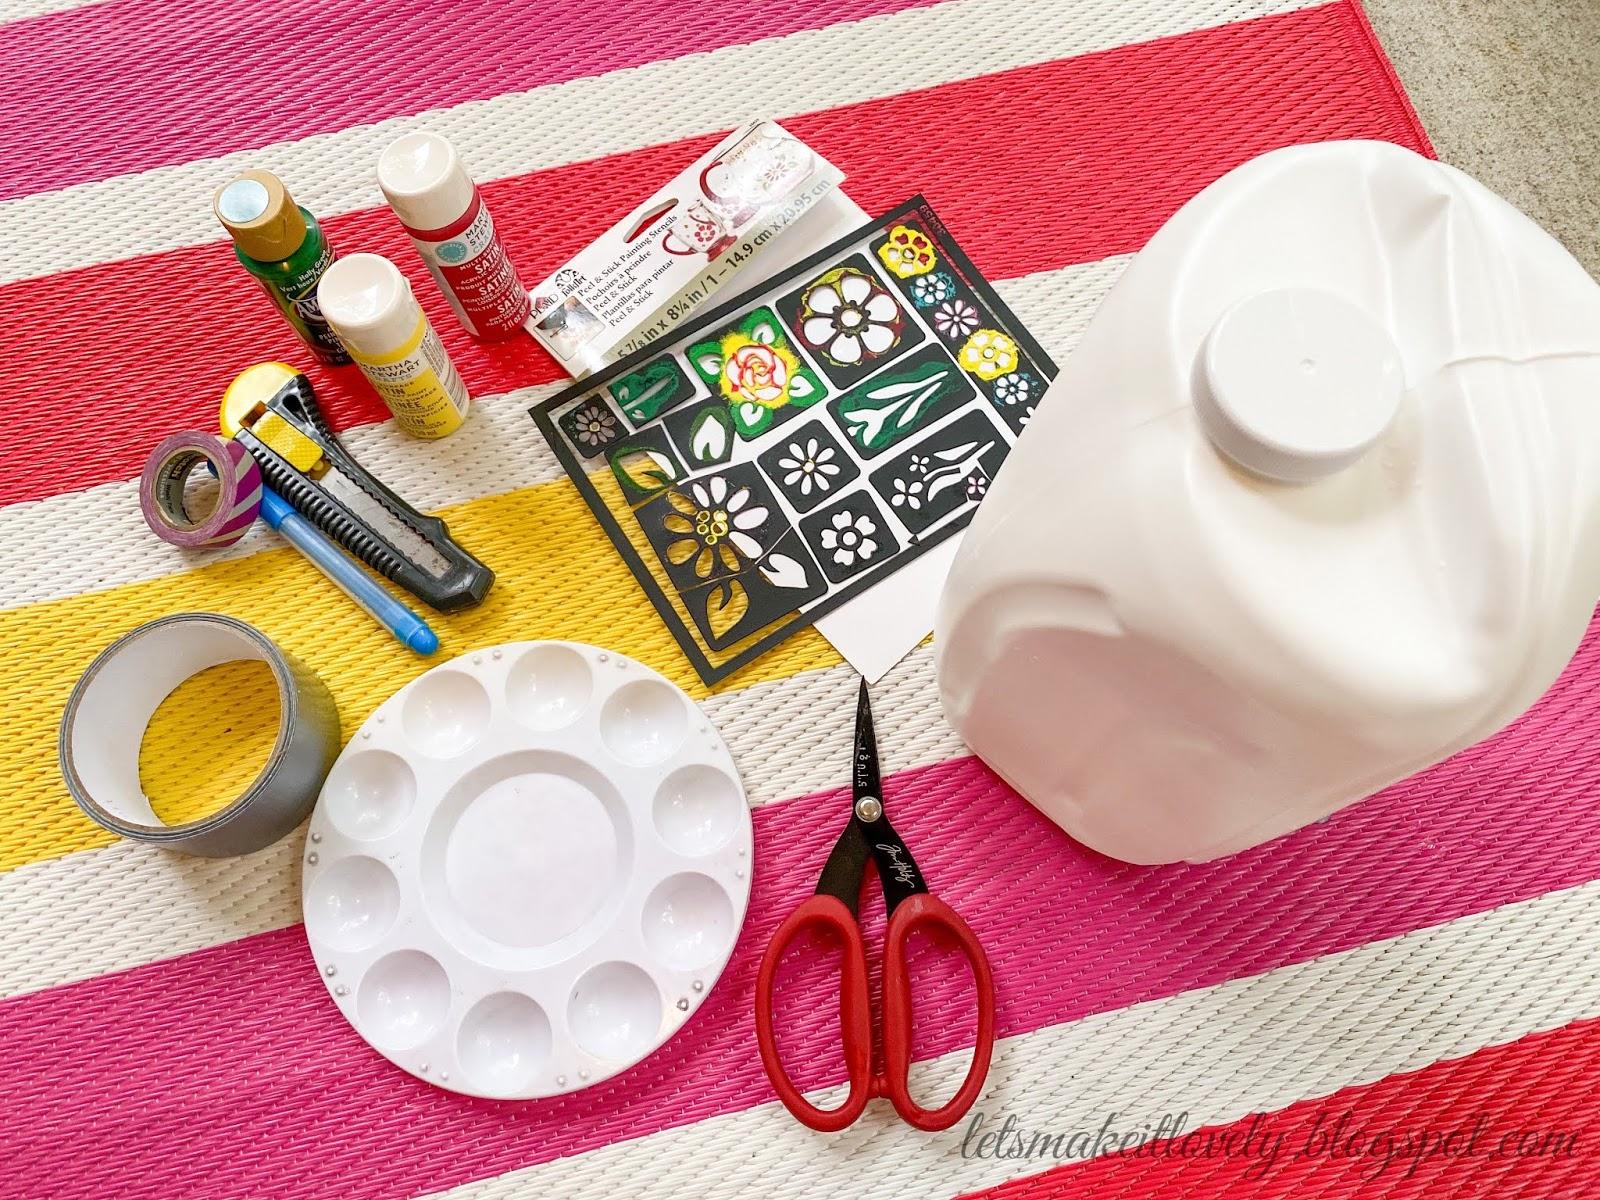 DIY Bird House, Kids Crafts, Summer activities for kids, Kids DIY, Kids DIY Bird House